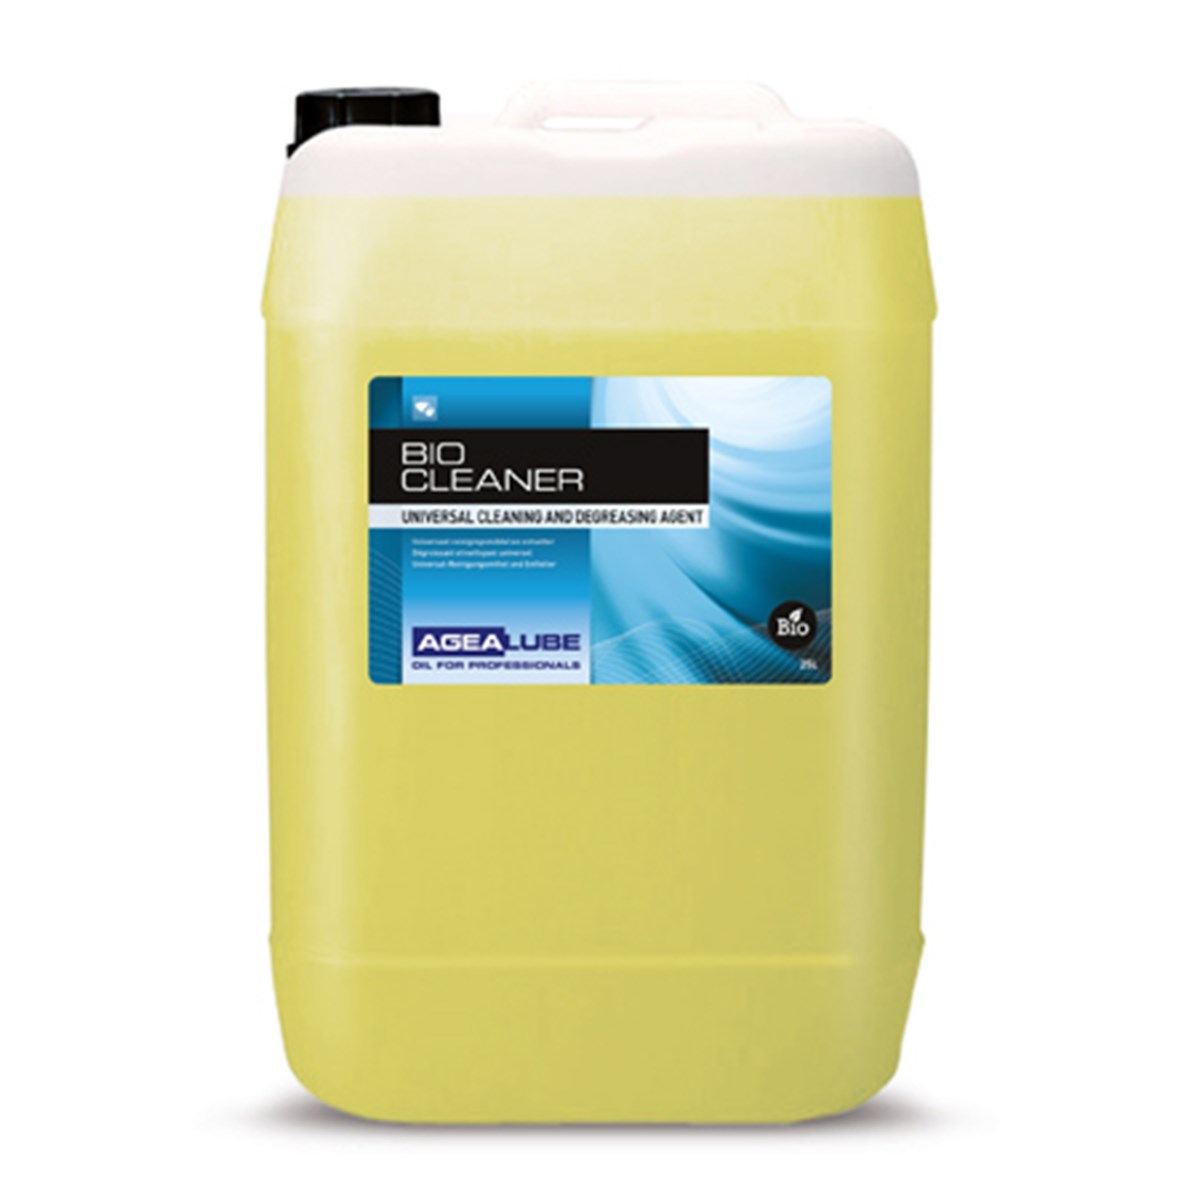 Agealube bio cleaner 20 liter